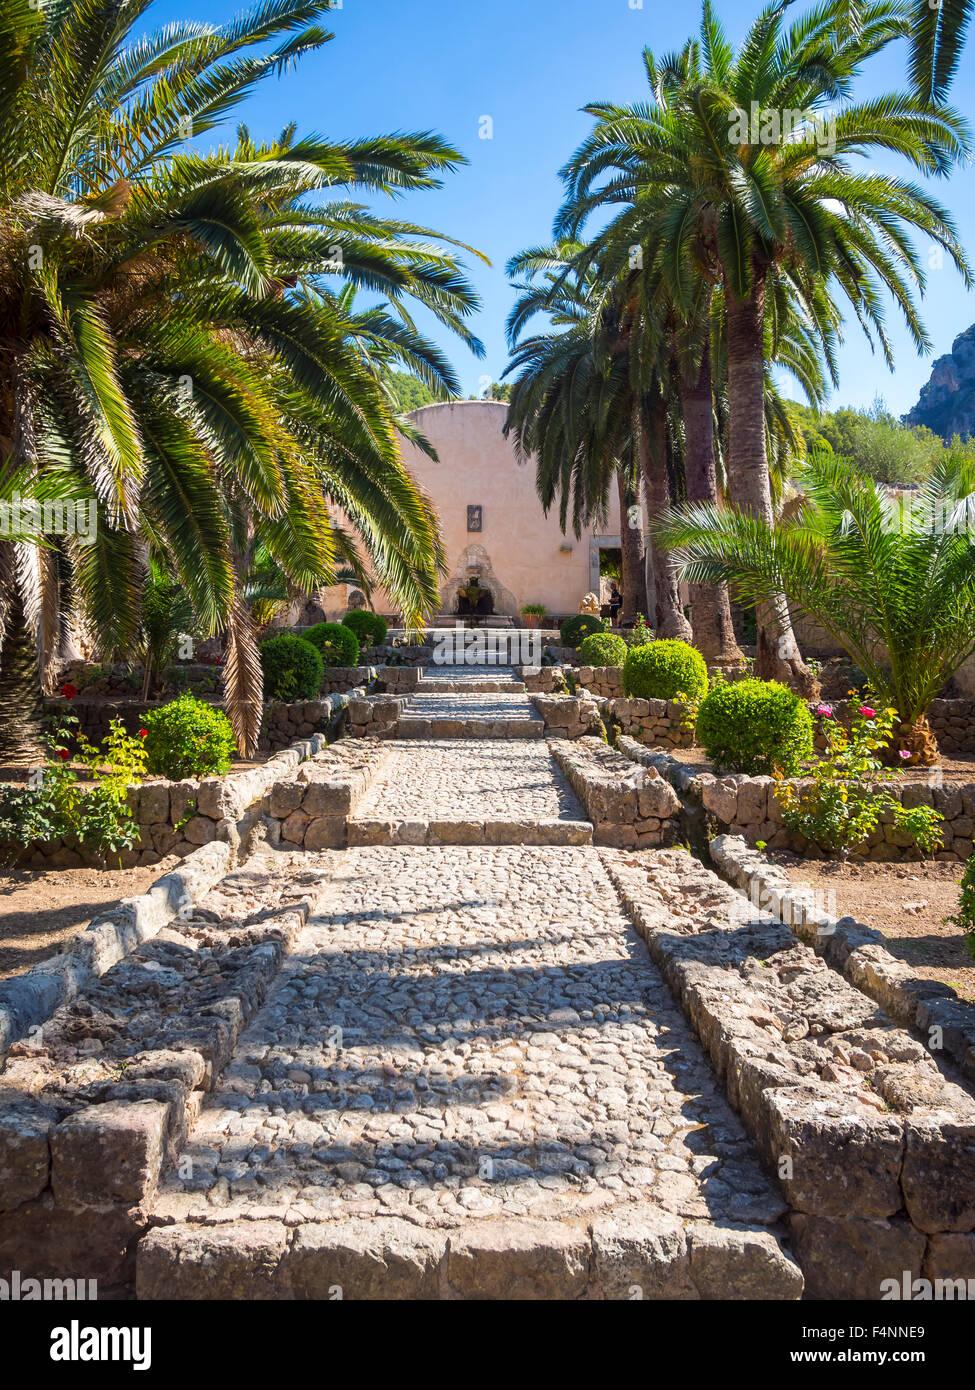 Jardines de Alfabia, Herrenhaus mit arabischen Gärten, Serra de Alfàbia, Mallorca, Spanien Stockbild